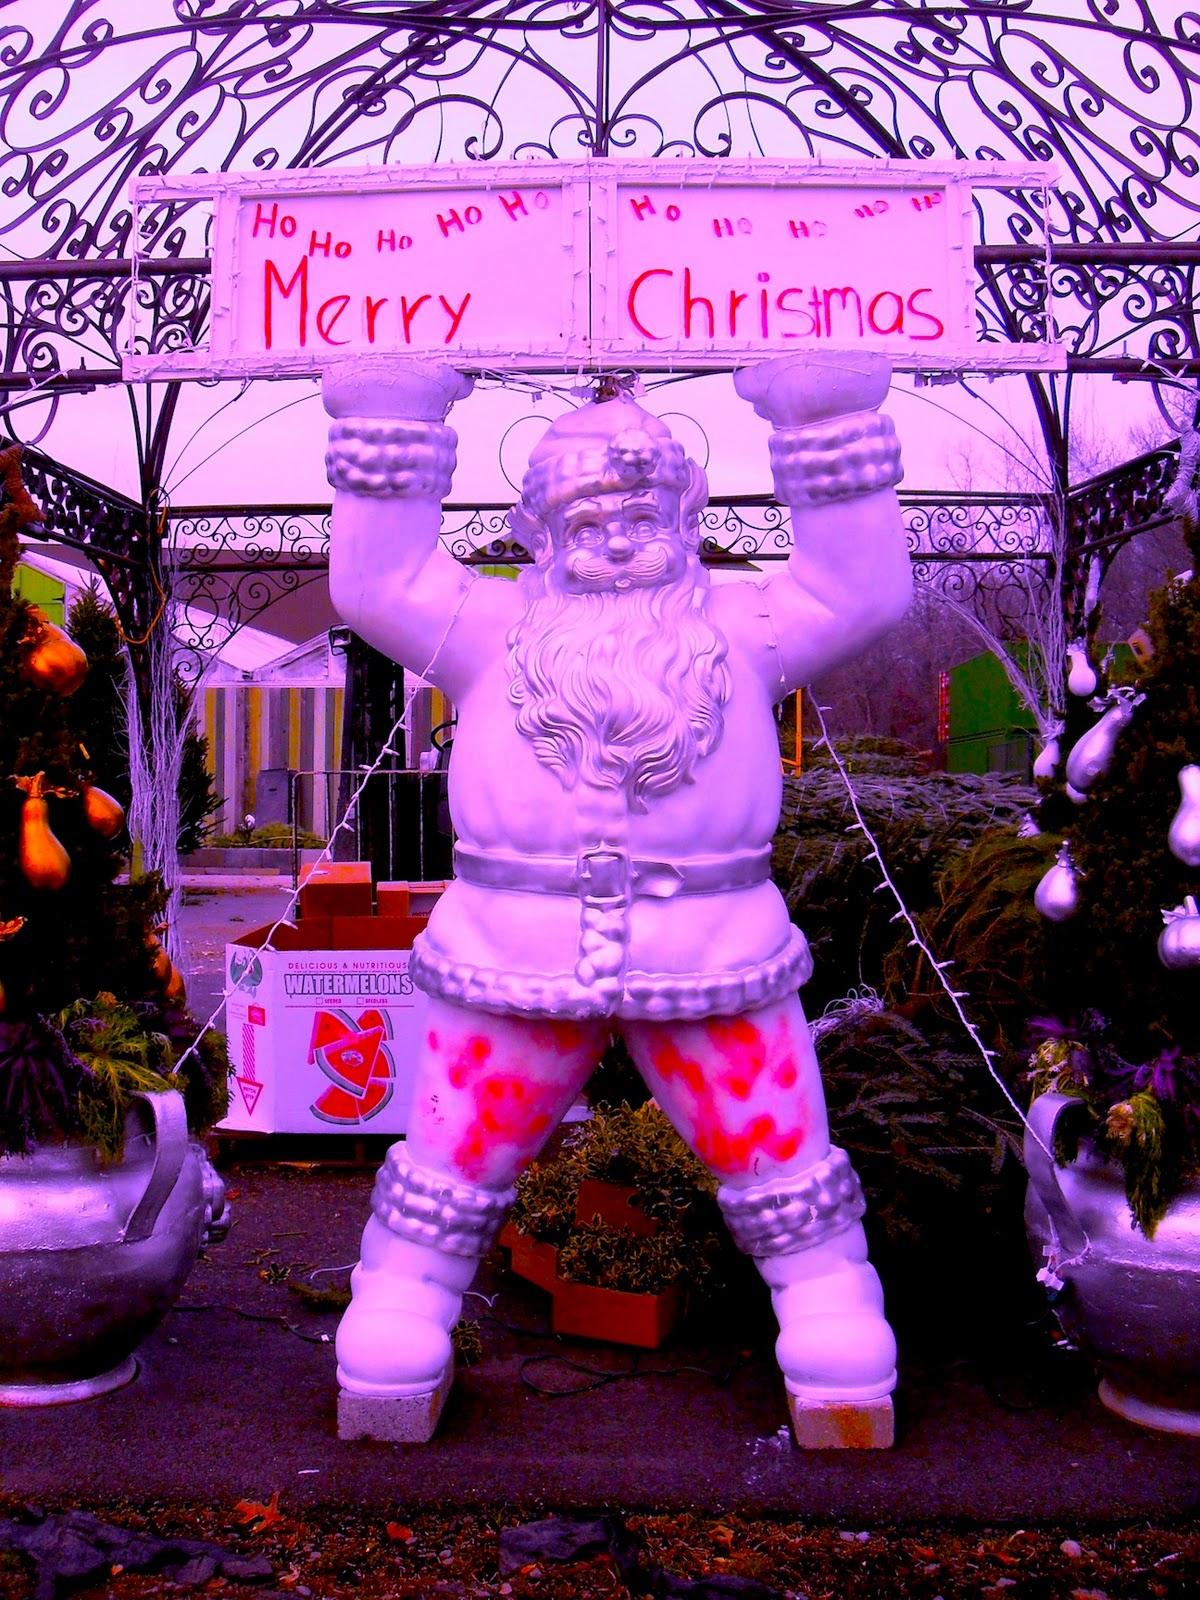 http://1.bp.blogspot.com/_n5KMEaGMNoA/TQTCNkiXOuI/AAAAAAAACsA/rYllbSWiqPo/s1600/Dragonfly+Farms+HAMILTON+NEW+JERSEY+Christmas+Decorations+I.JPG